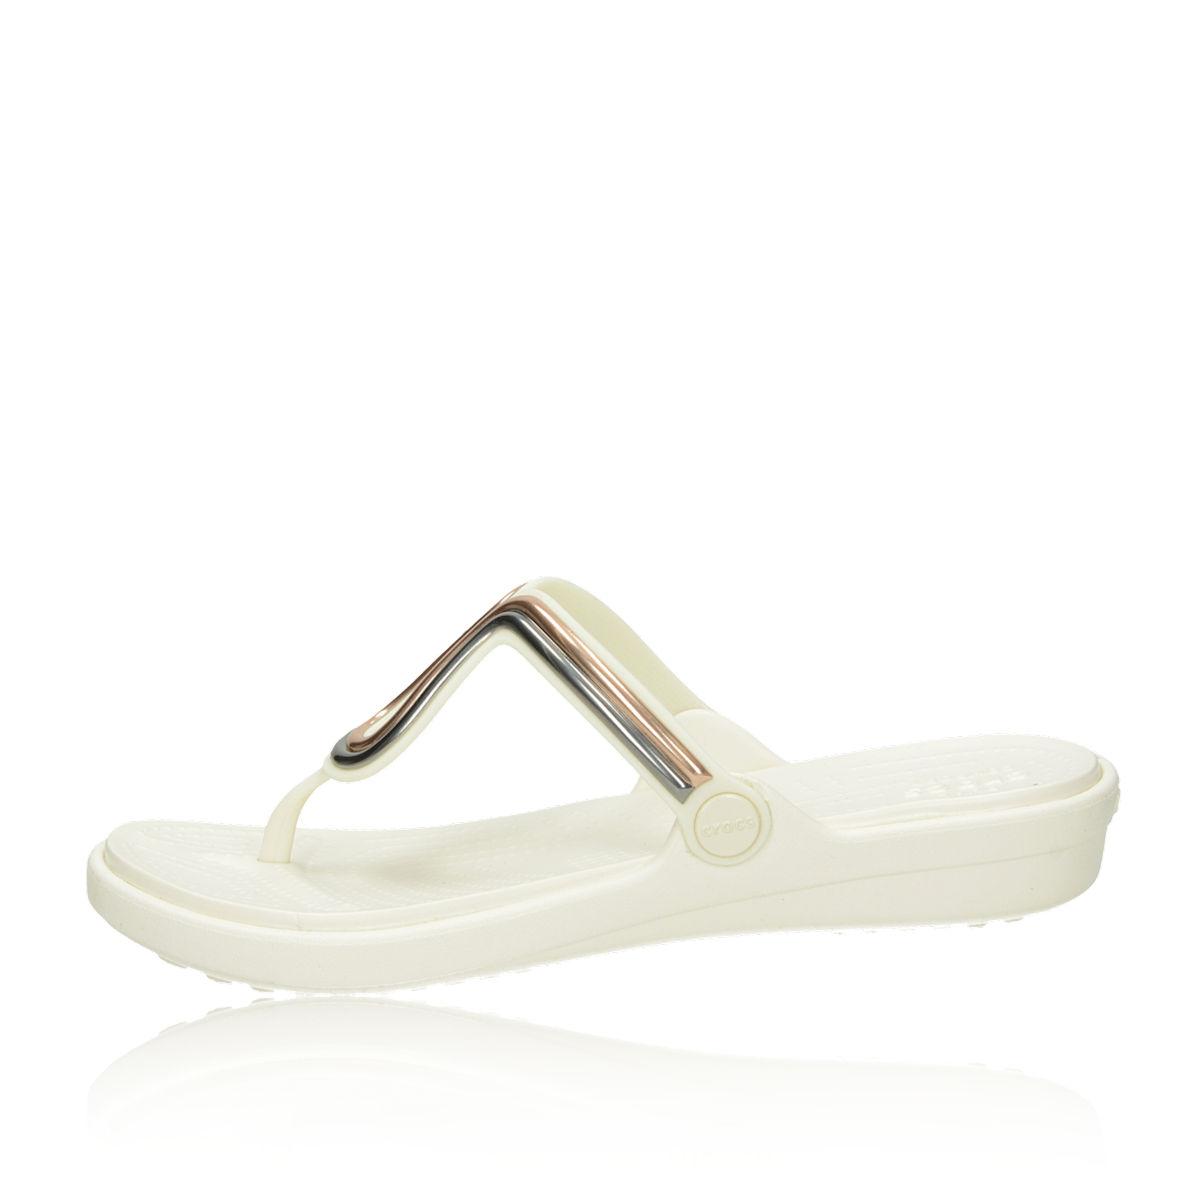 Crocs dámske štýlové šľapky - biele